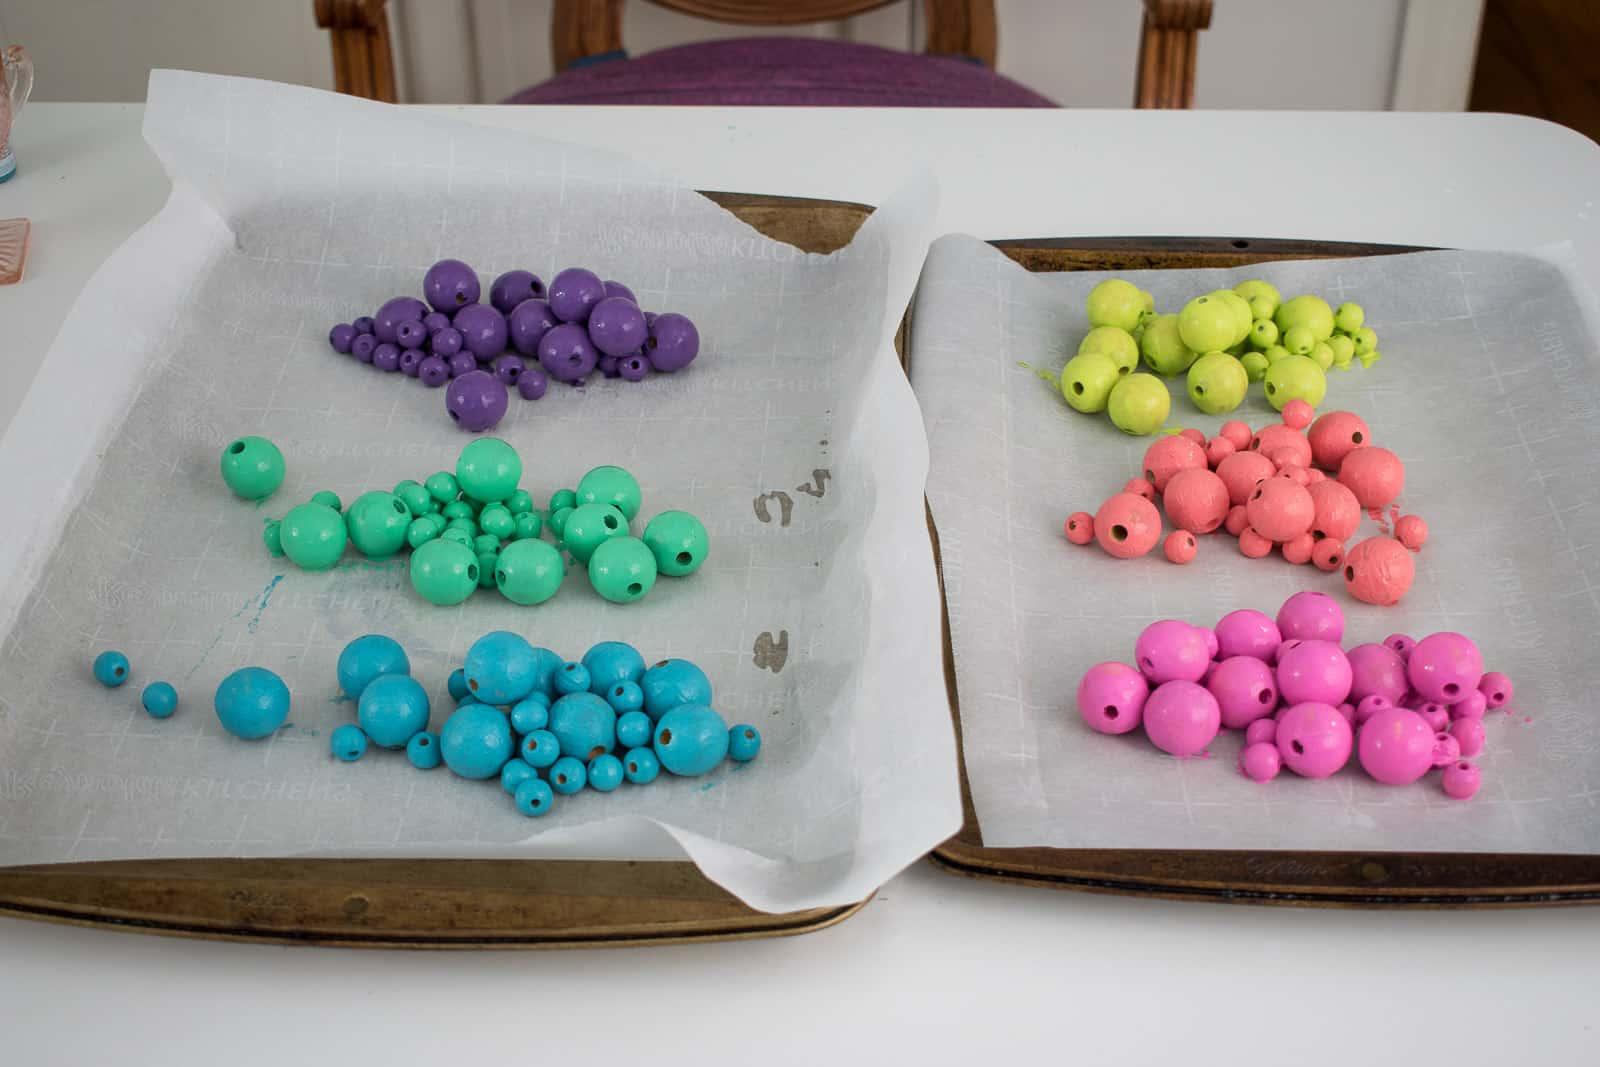 pour the beads onto parchment paper